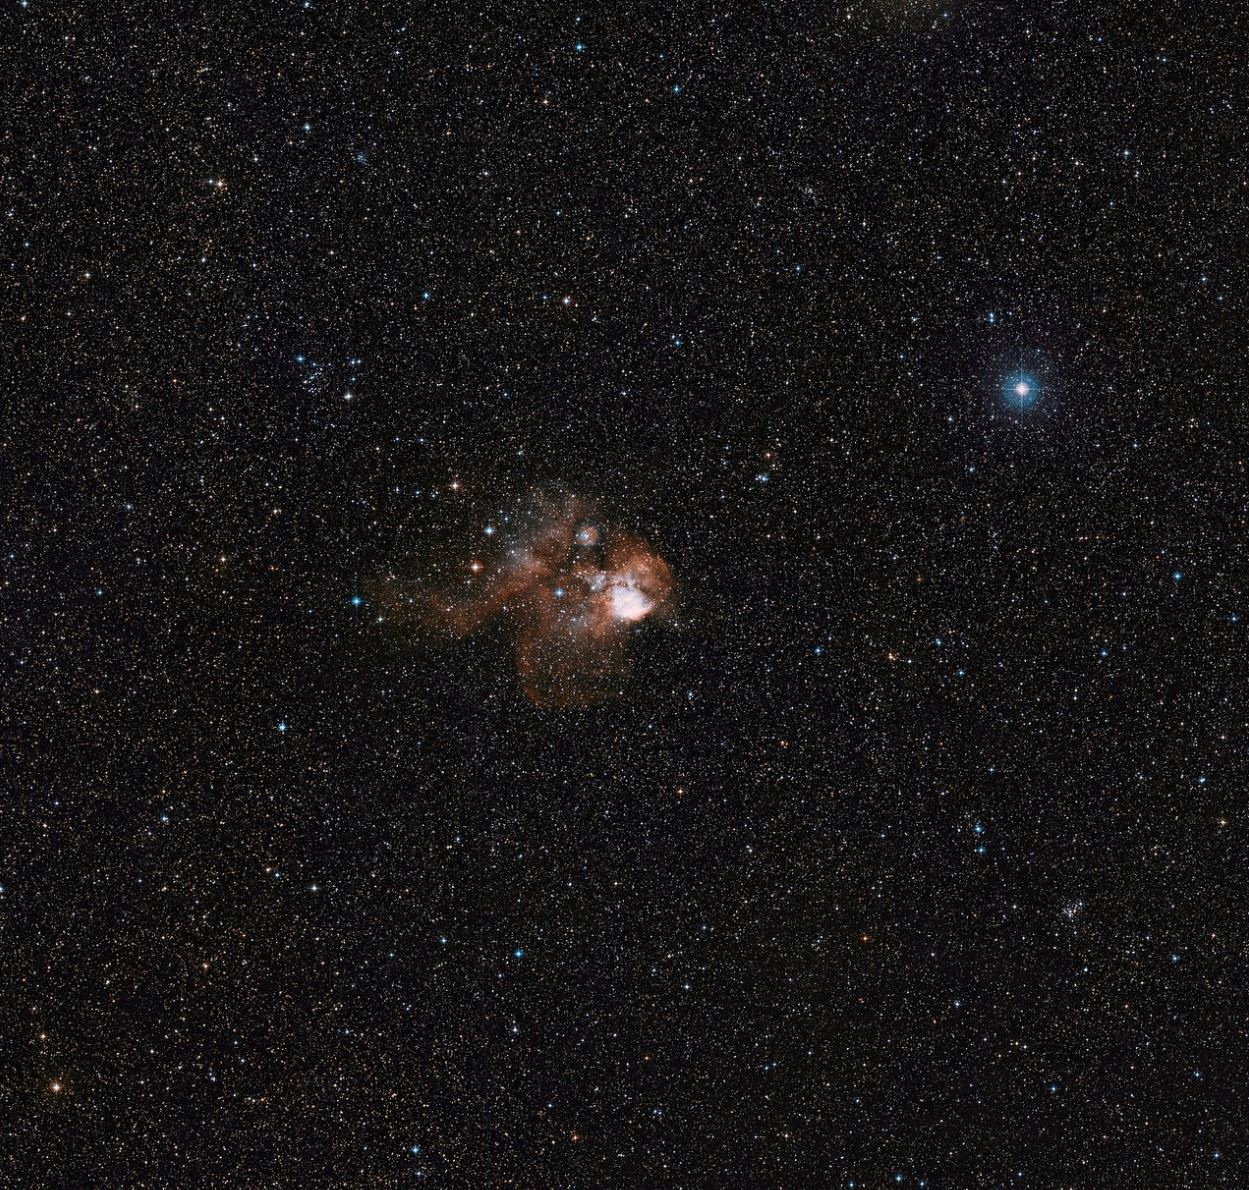 Image Credit: ESO/Digitized Sky Survey 2. Acknowledgment: Davide De Martin